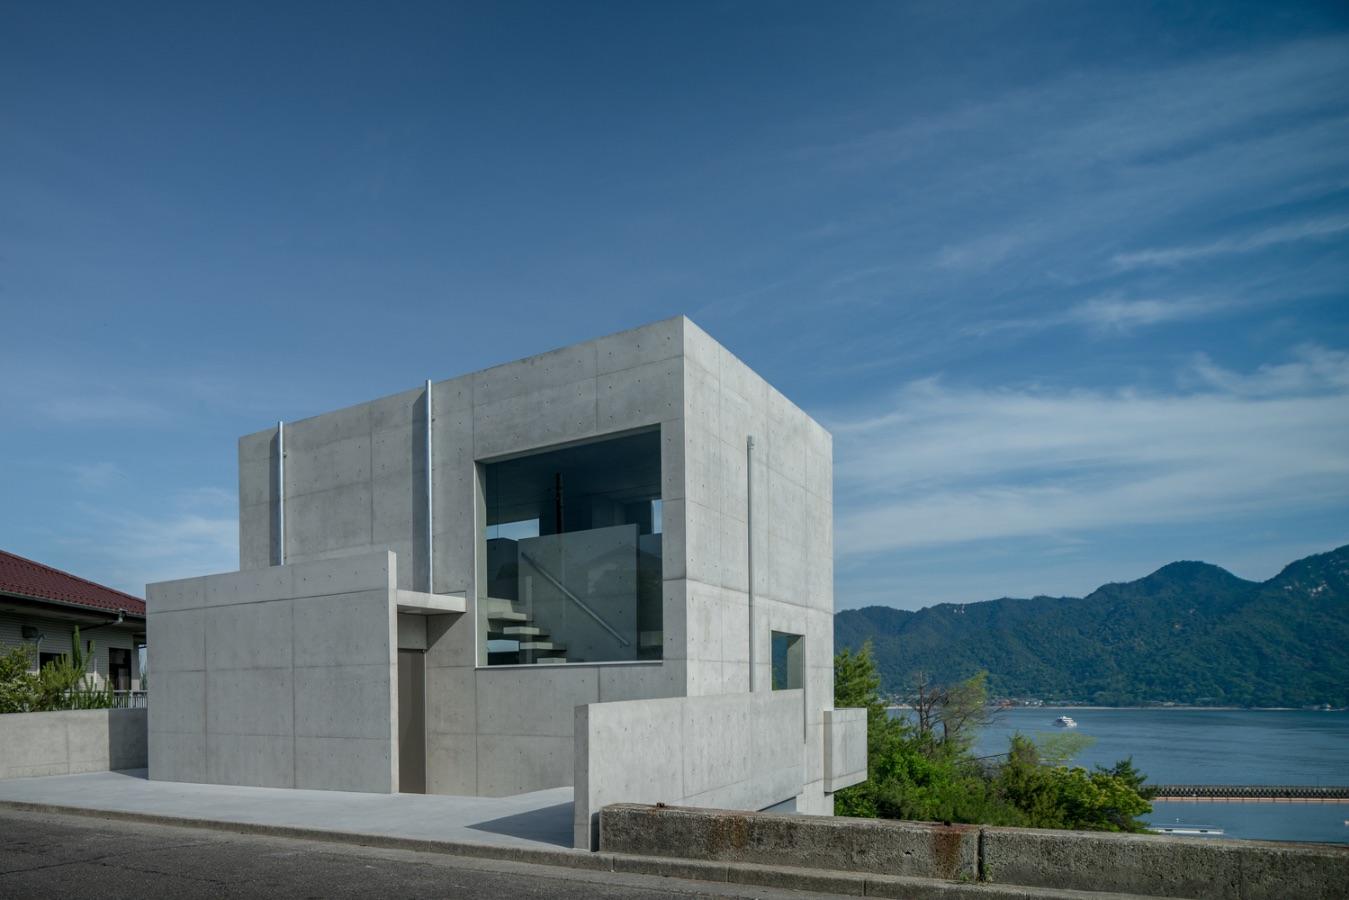 9_House in Ajina_Kazunori Fujimoto Architect & Associates_Inspirationist